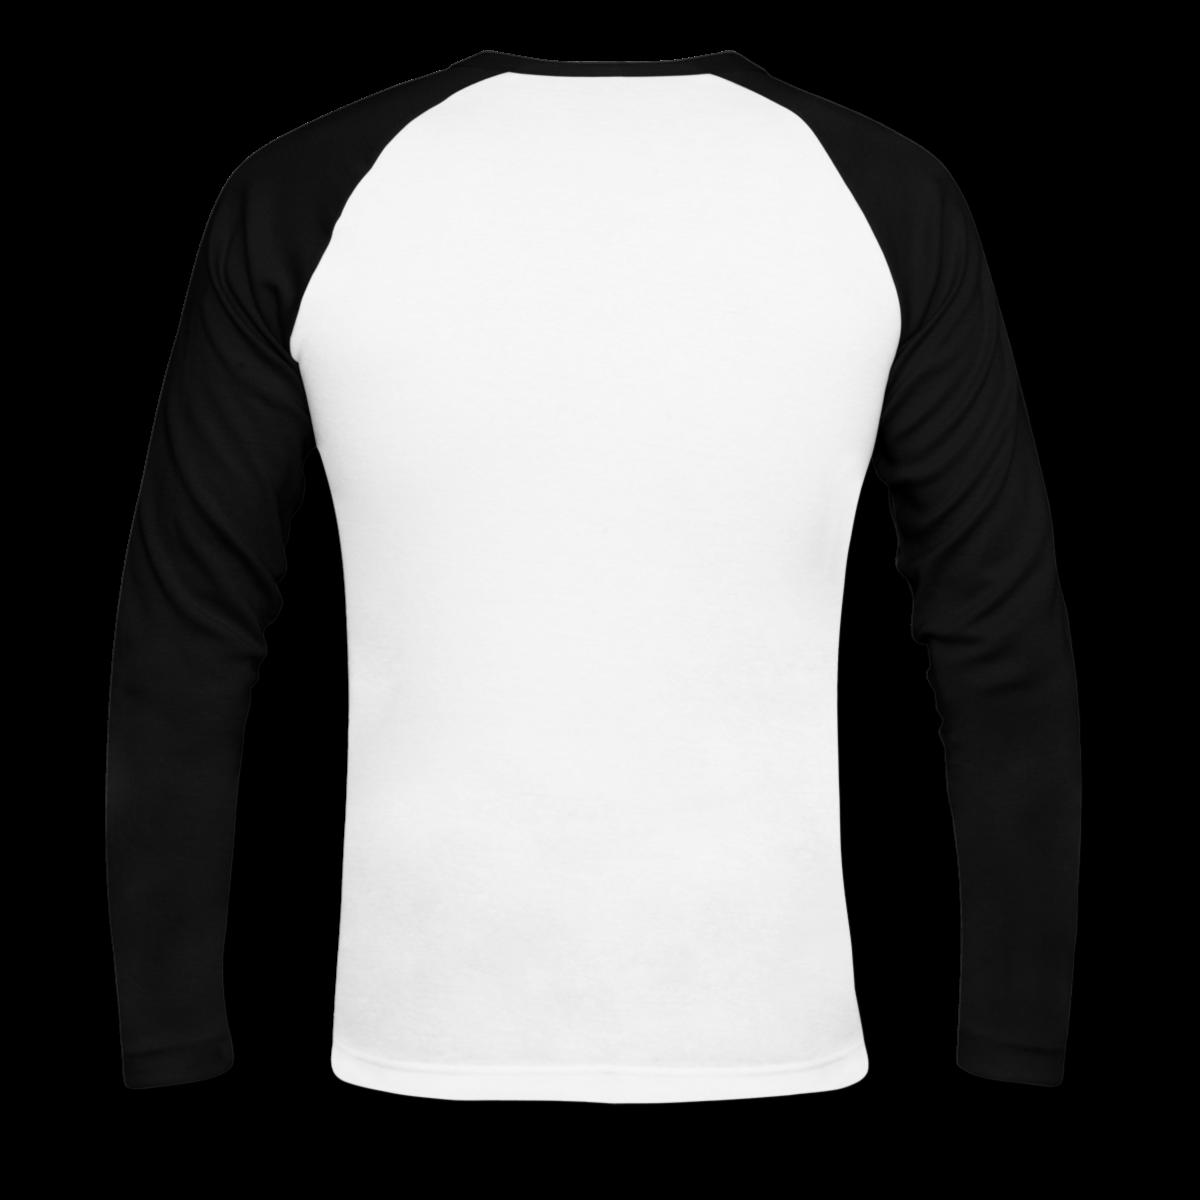 Baseball shirt ideas clipart. Blank t silhouette at